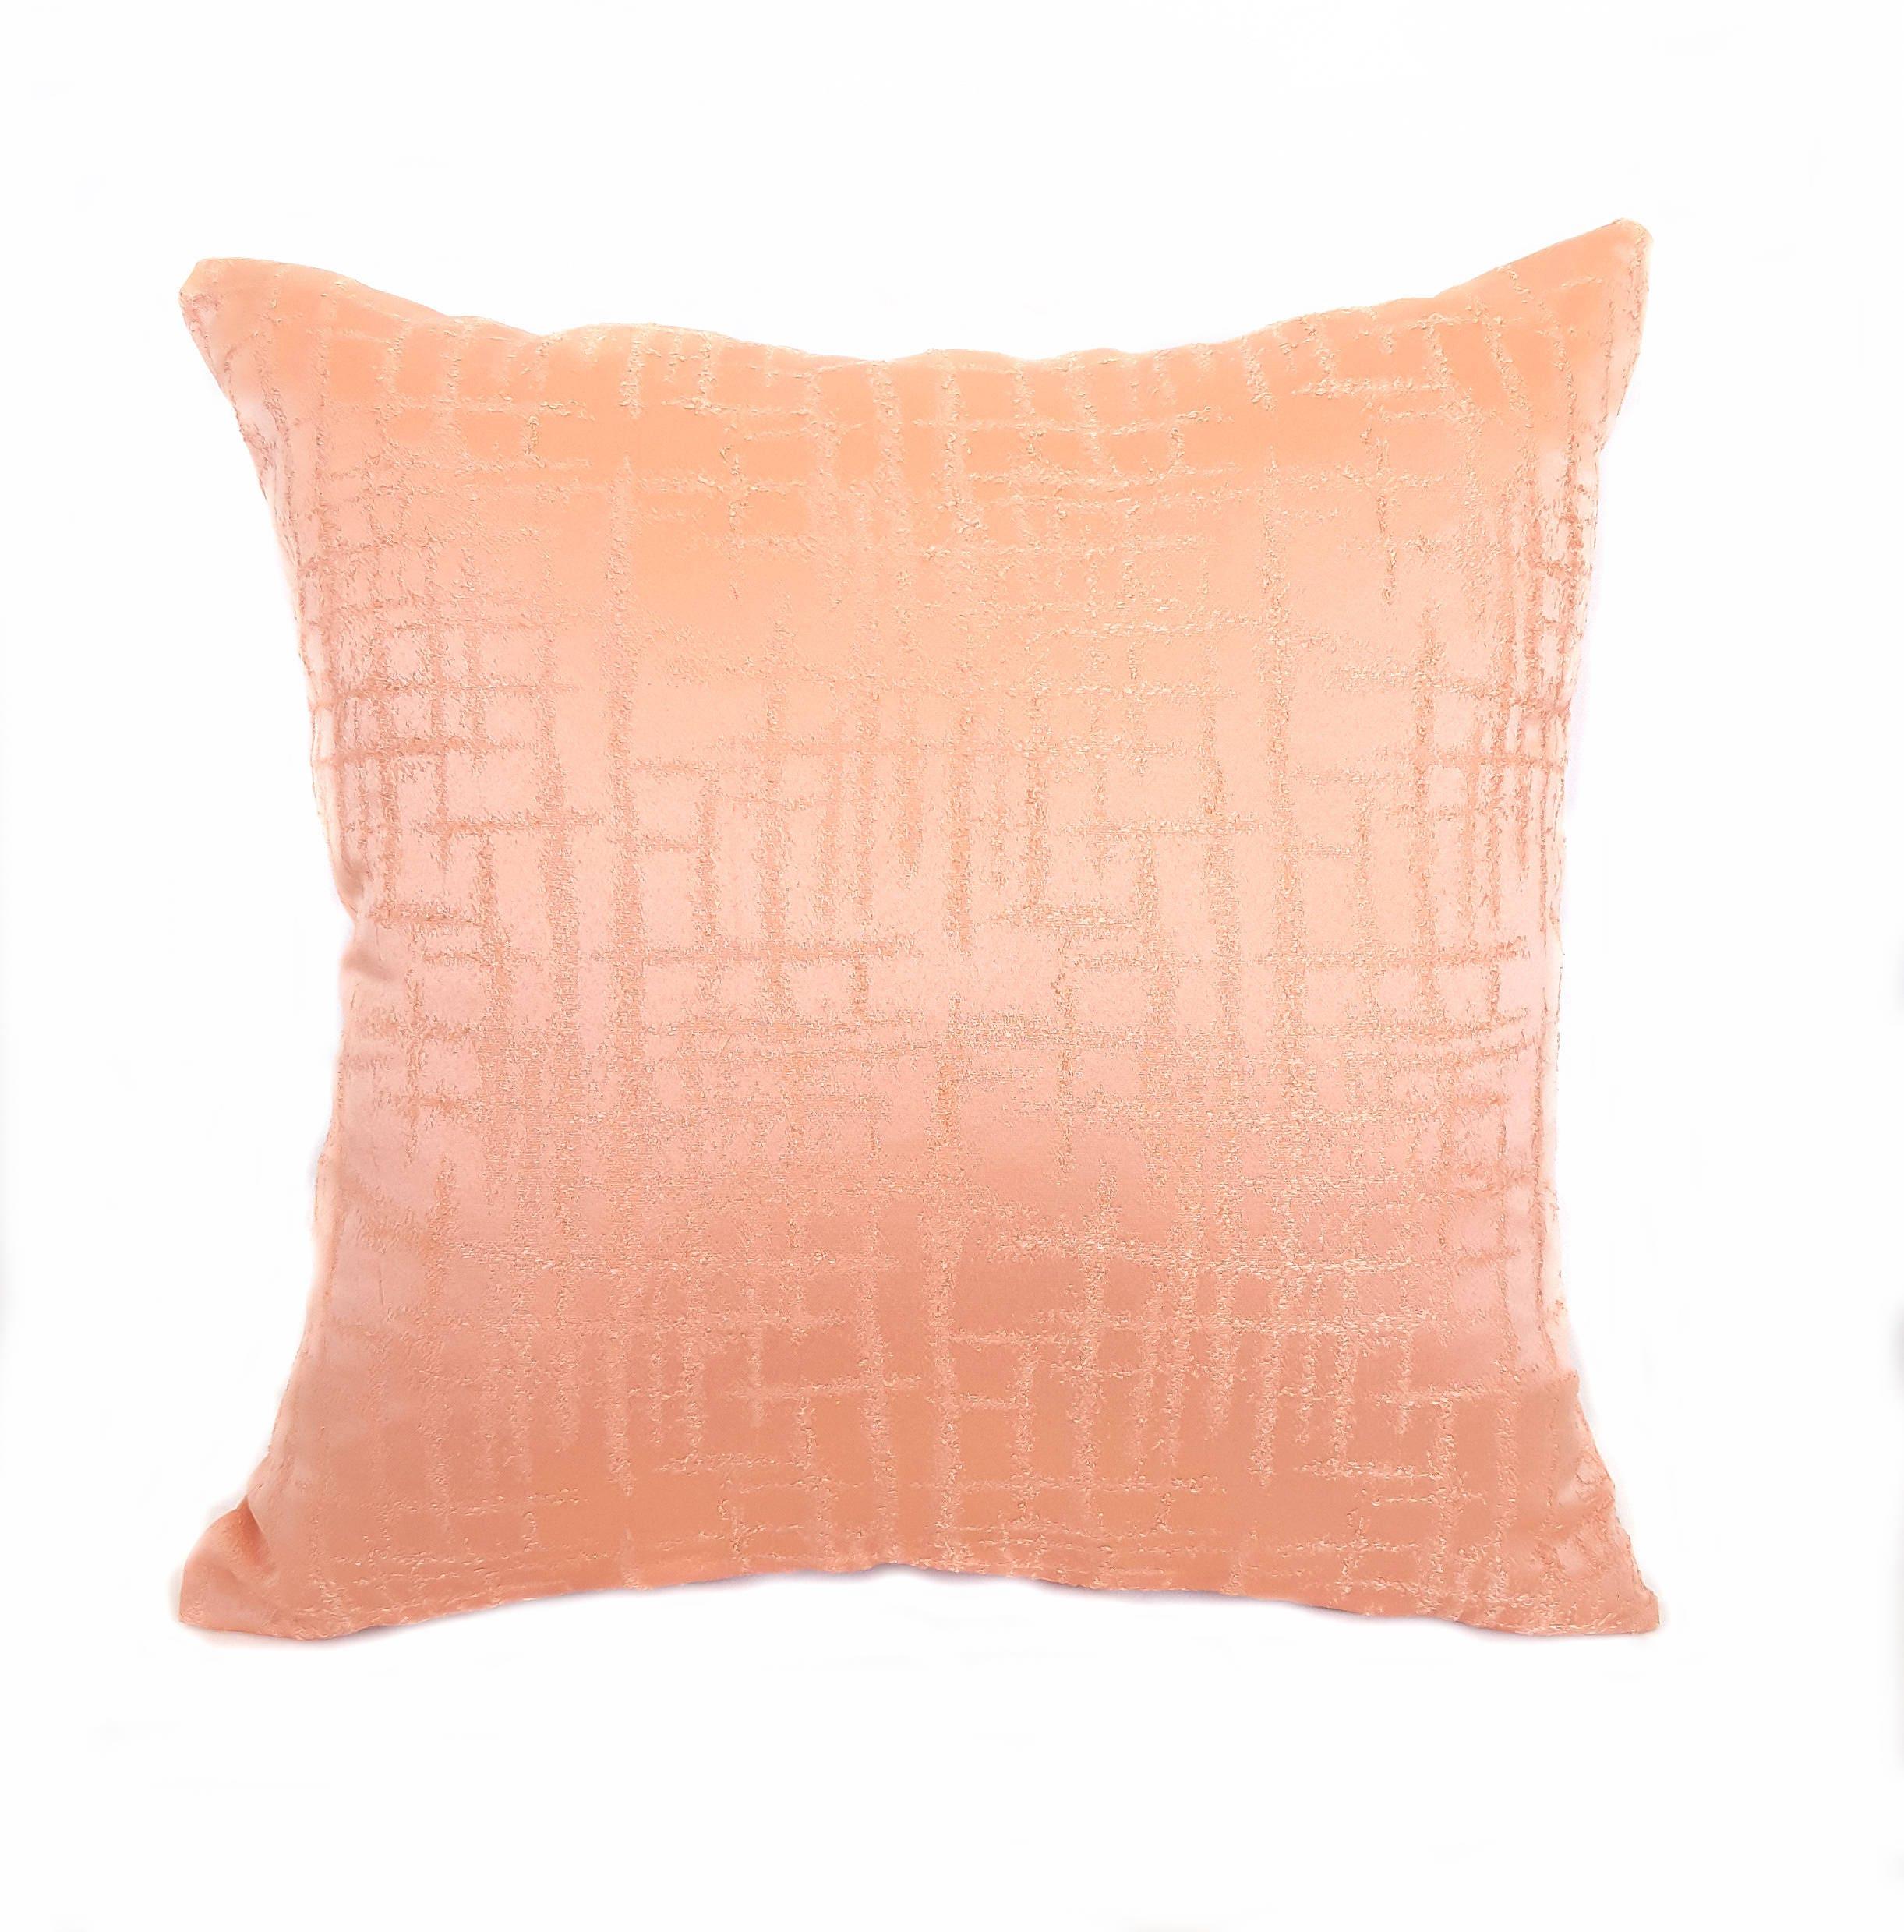 decor decorative surya pillows from pin pillow camel maize hayneedle com peach